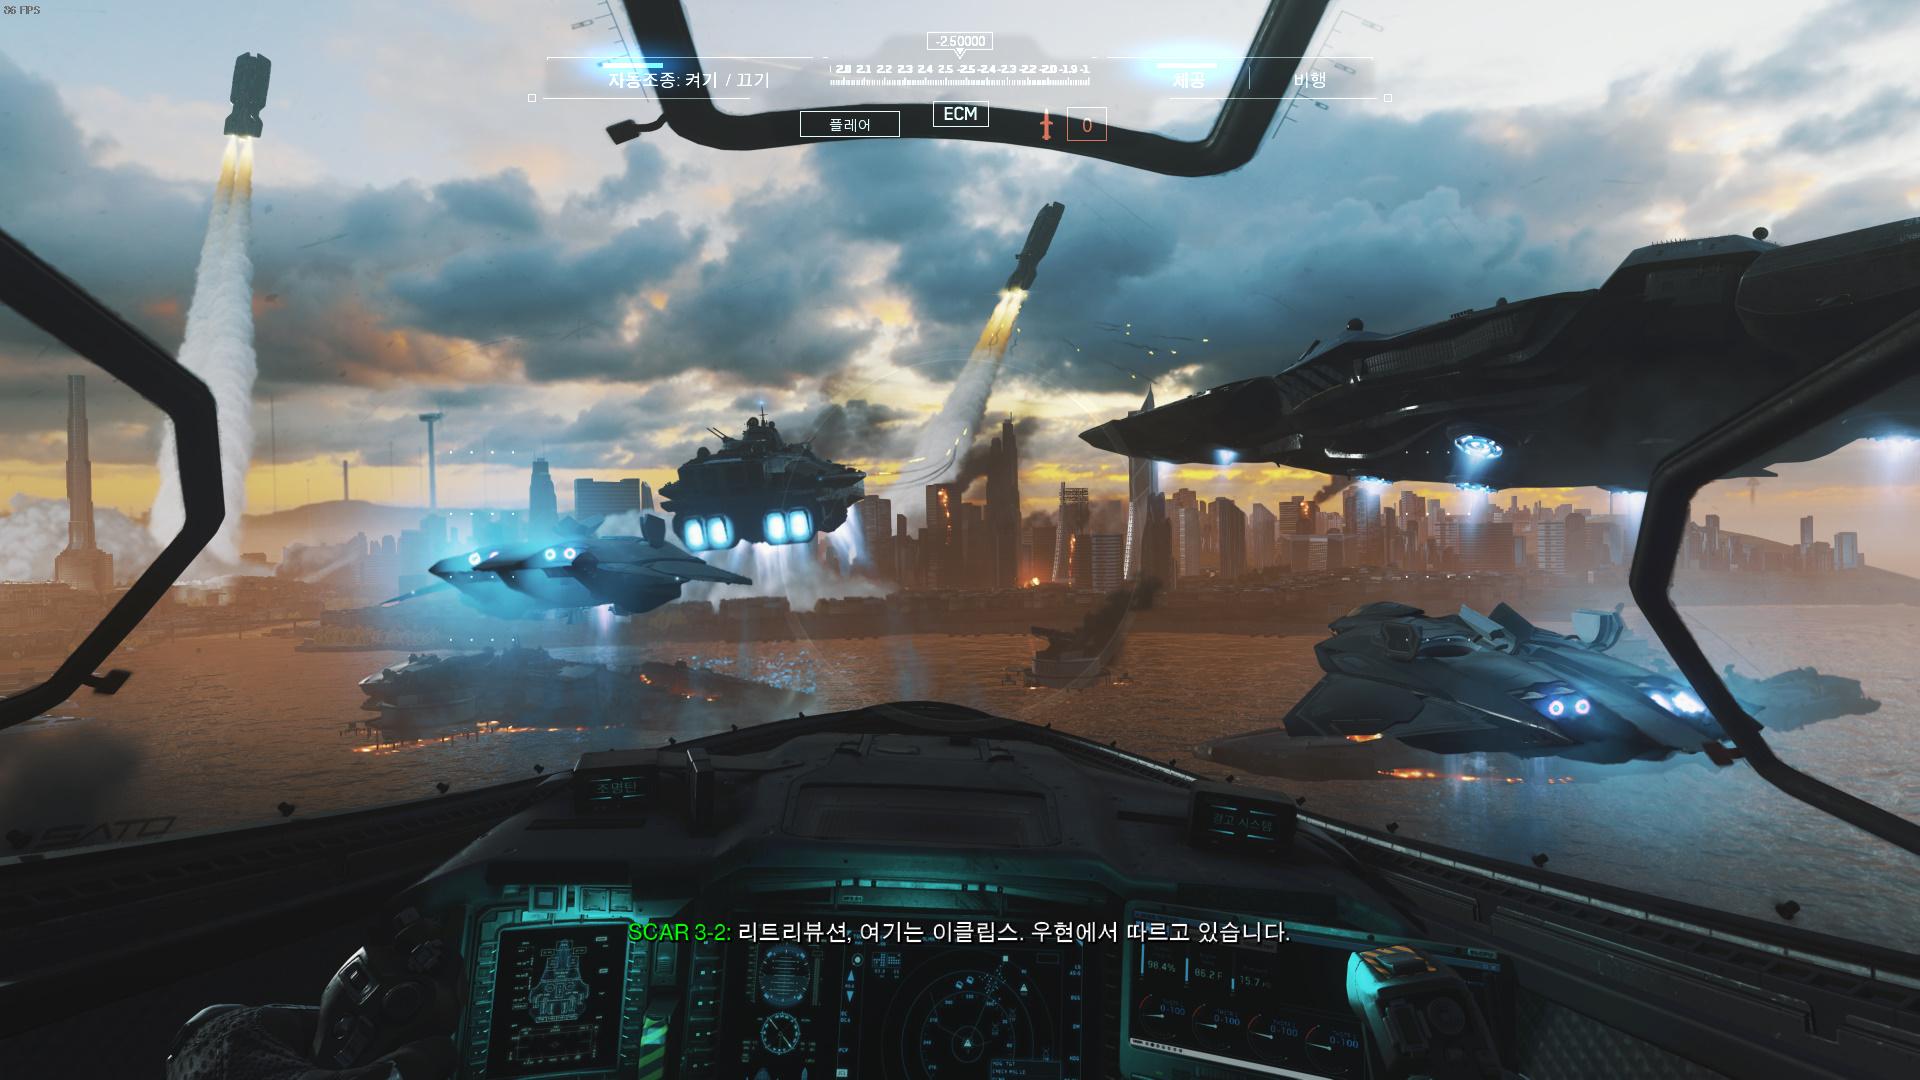 iw7_ship 2017-10-11 18-26-56-308.jpg